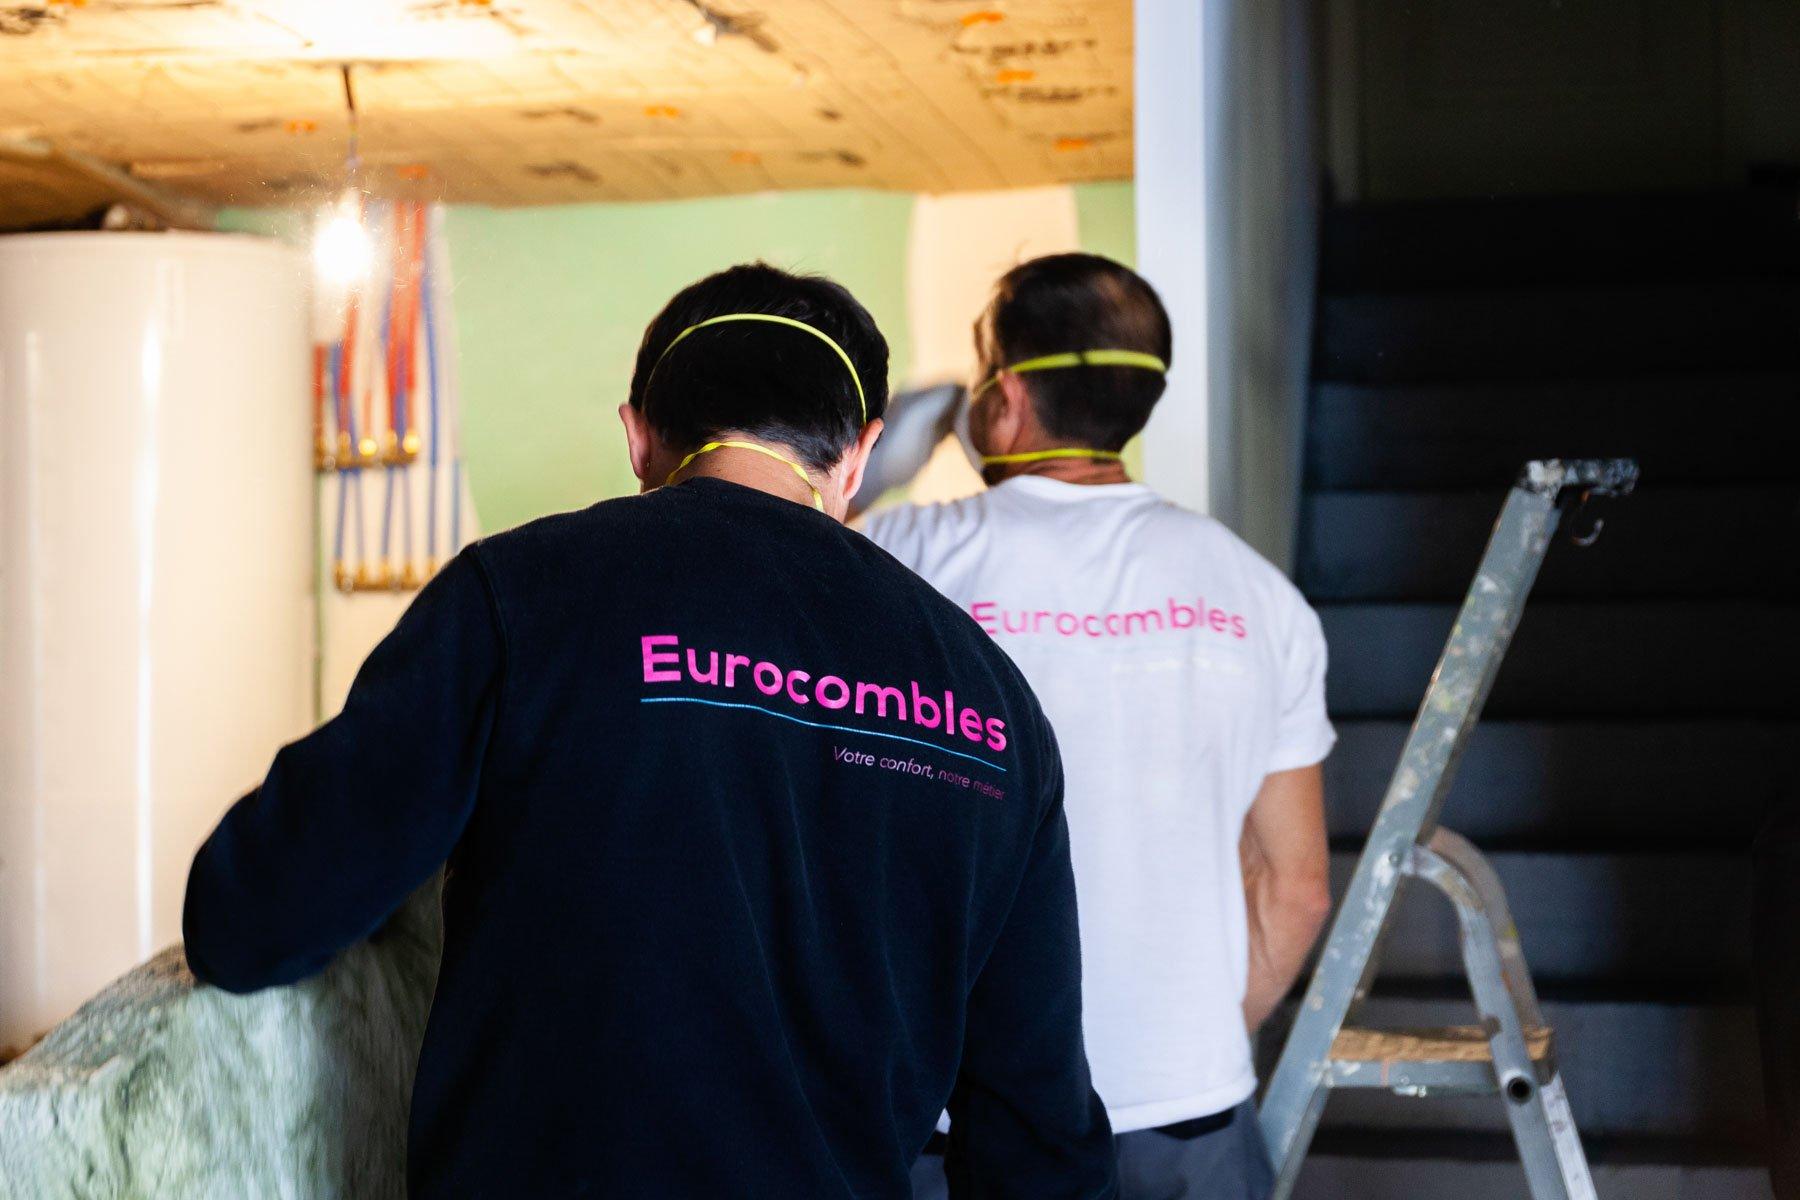 Reportage photo corporate Eurocombles photo reportage entreprise Karine A. Photographie1 - Reportage photo professionnel - Eurocombles